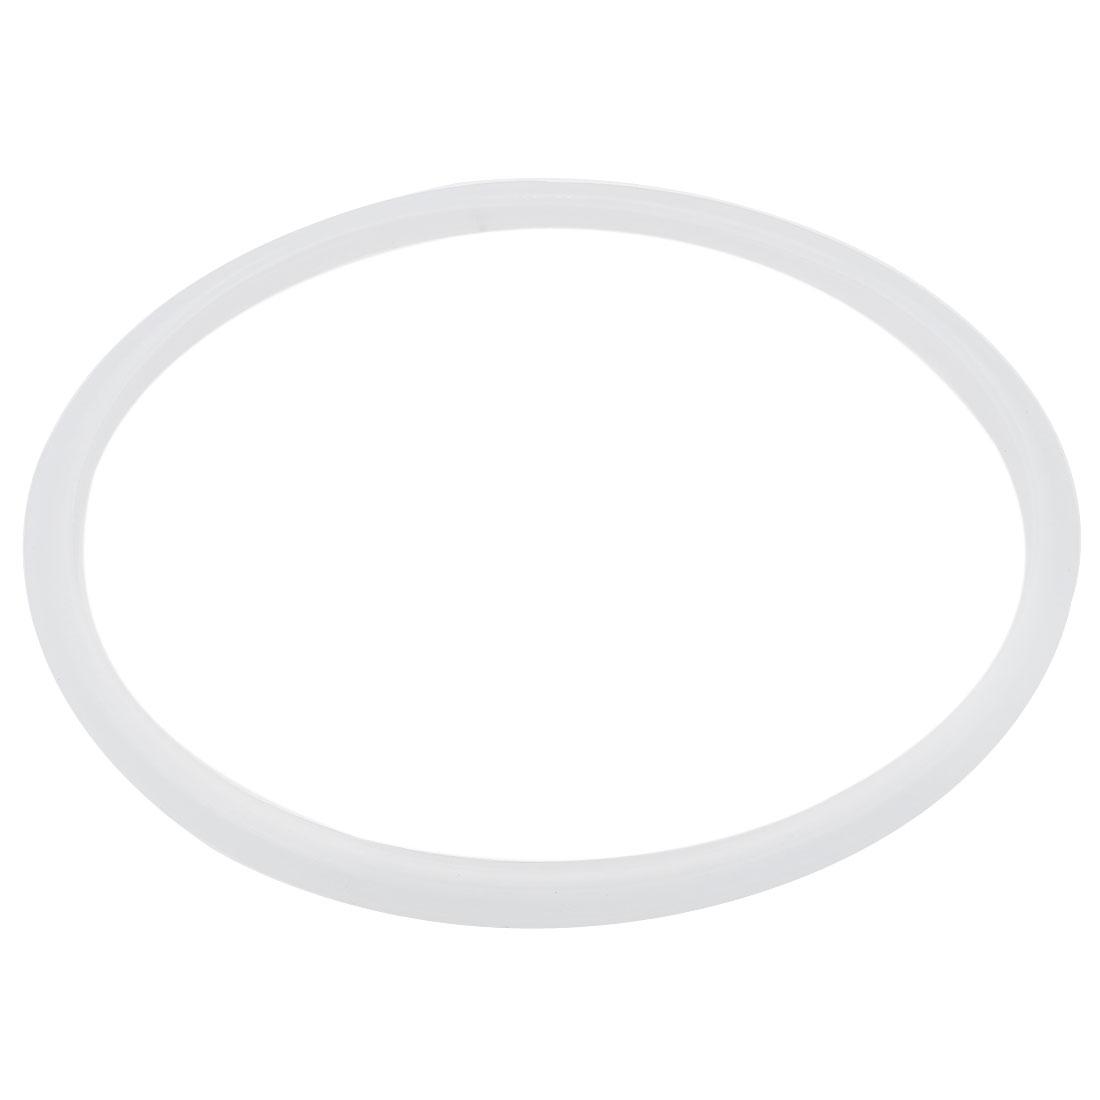 2 Pcs Rubber Pressure Cooker Part Gasket Sealing Ring 22cm Inner Dia White